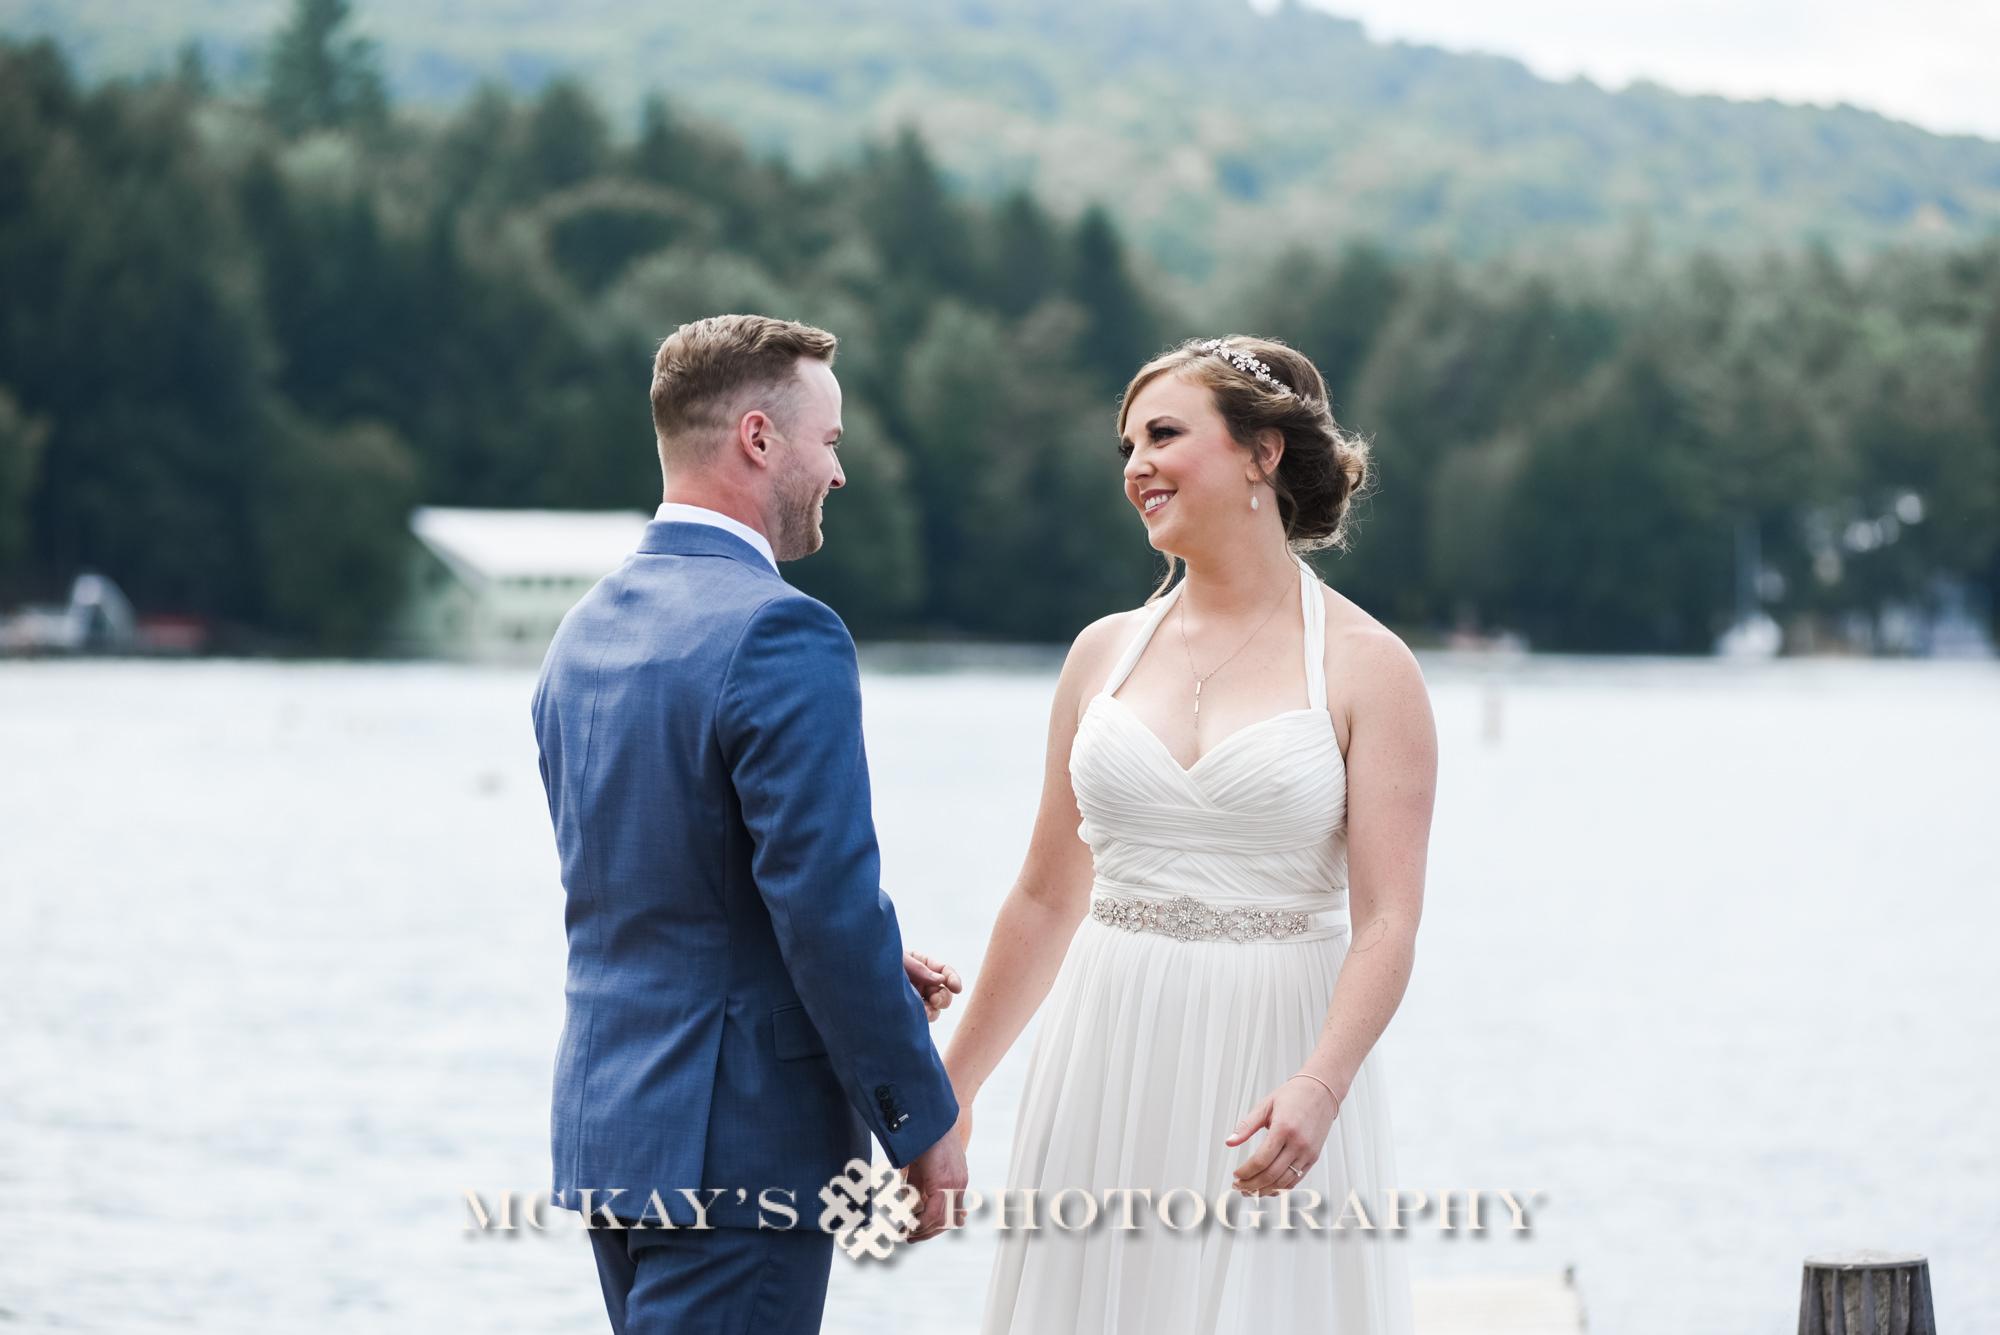 ADK wedding photographer Heather McKay